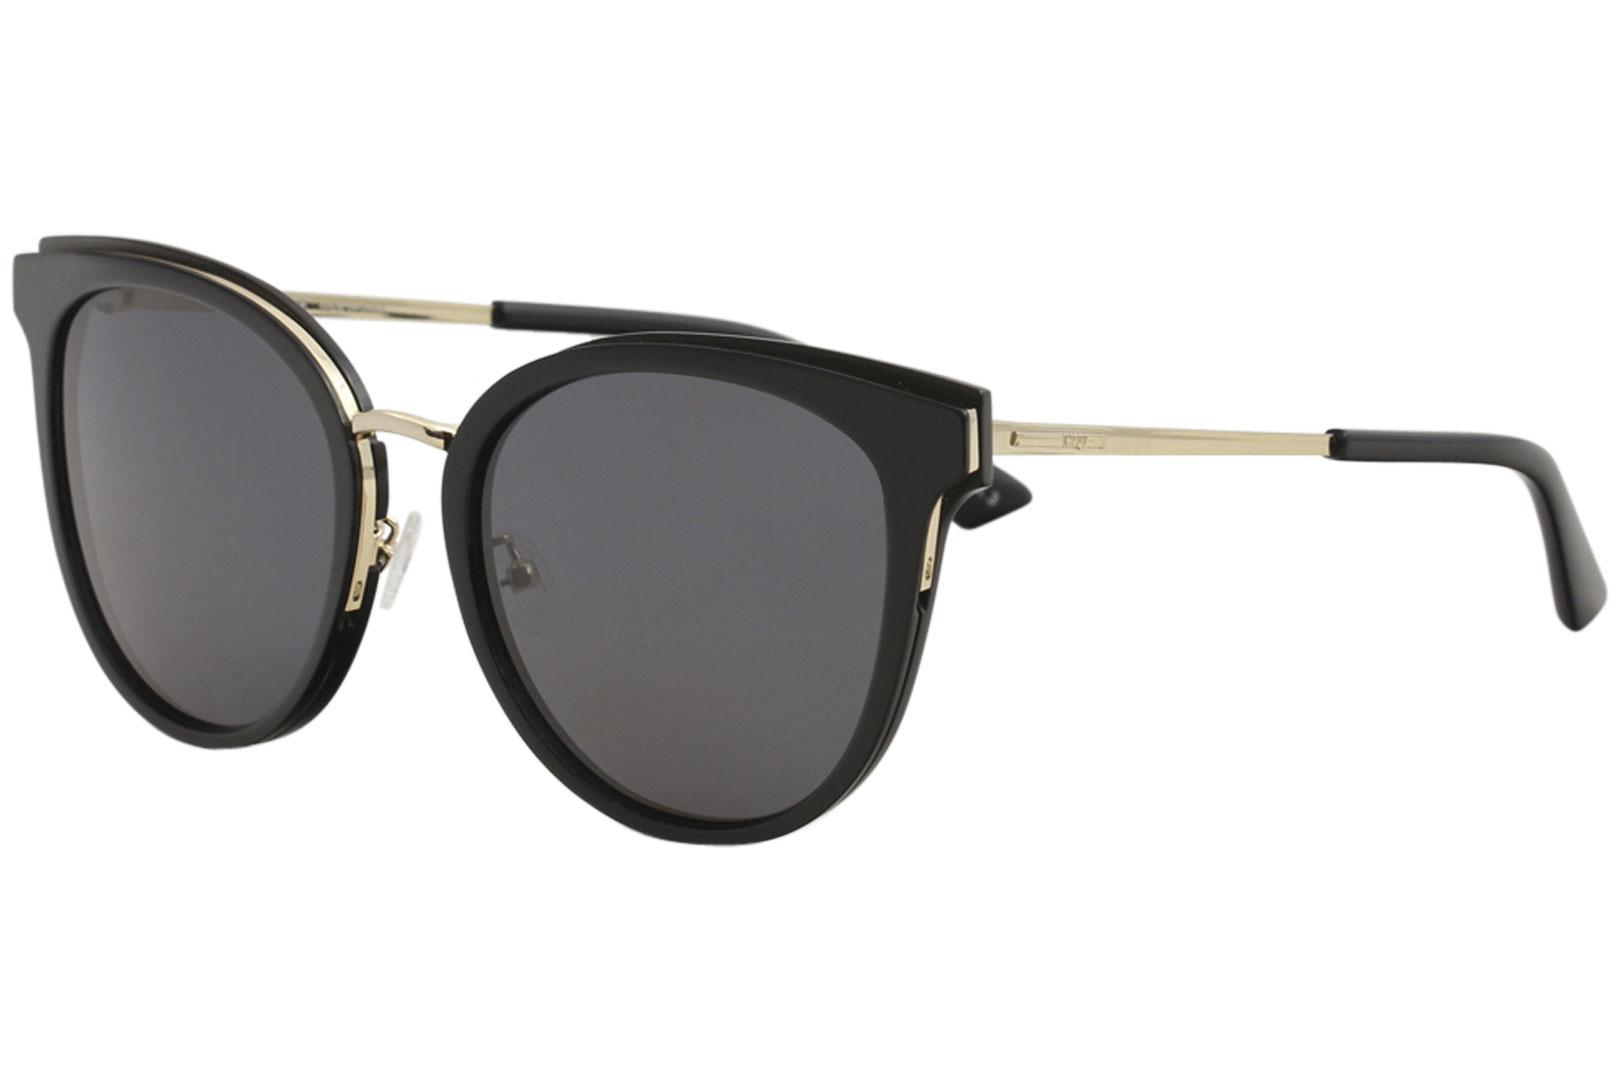 Image of McQ Women's MQ0104SK MQ/0104/SK 001 Black/Gold Fashion Cat Eye Sunglasses 56mm - Black Gold/Grey   001 - Lens 56 Bridge 19 Temple 145mm